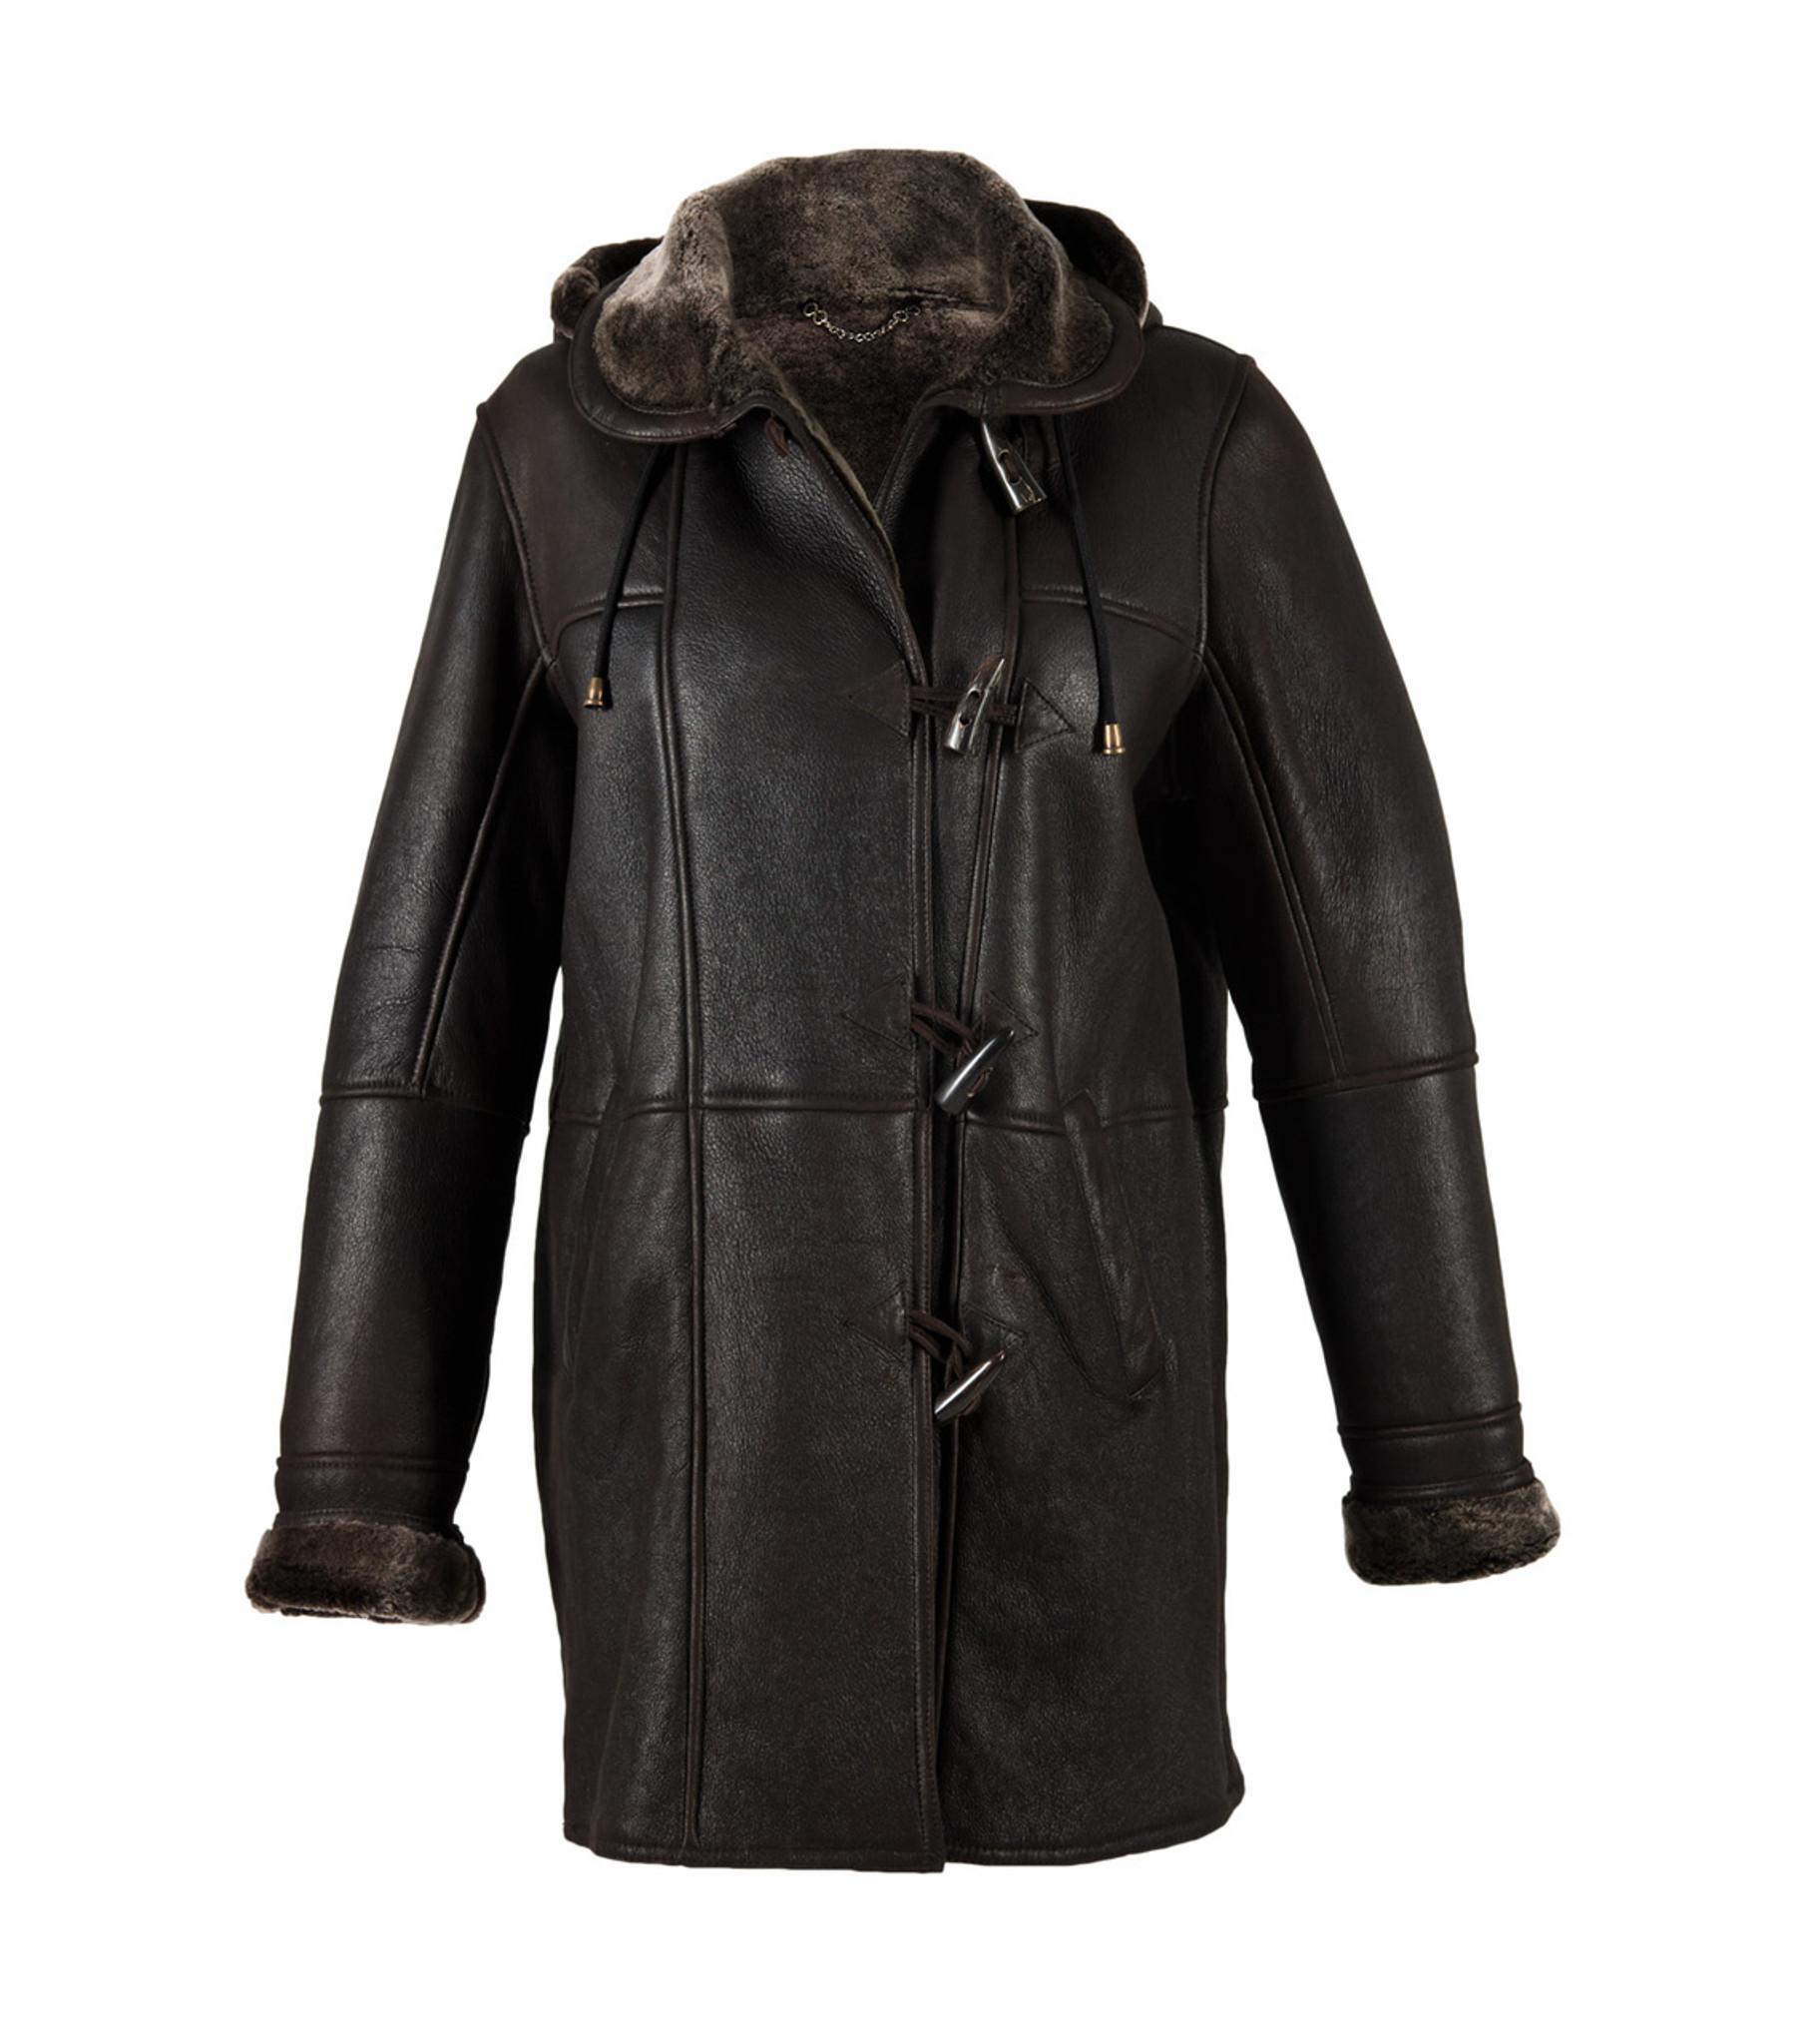 3b1e625606 Sheepskin Duffle Coat - Millie Sold By Cool Sheepskin UK